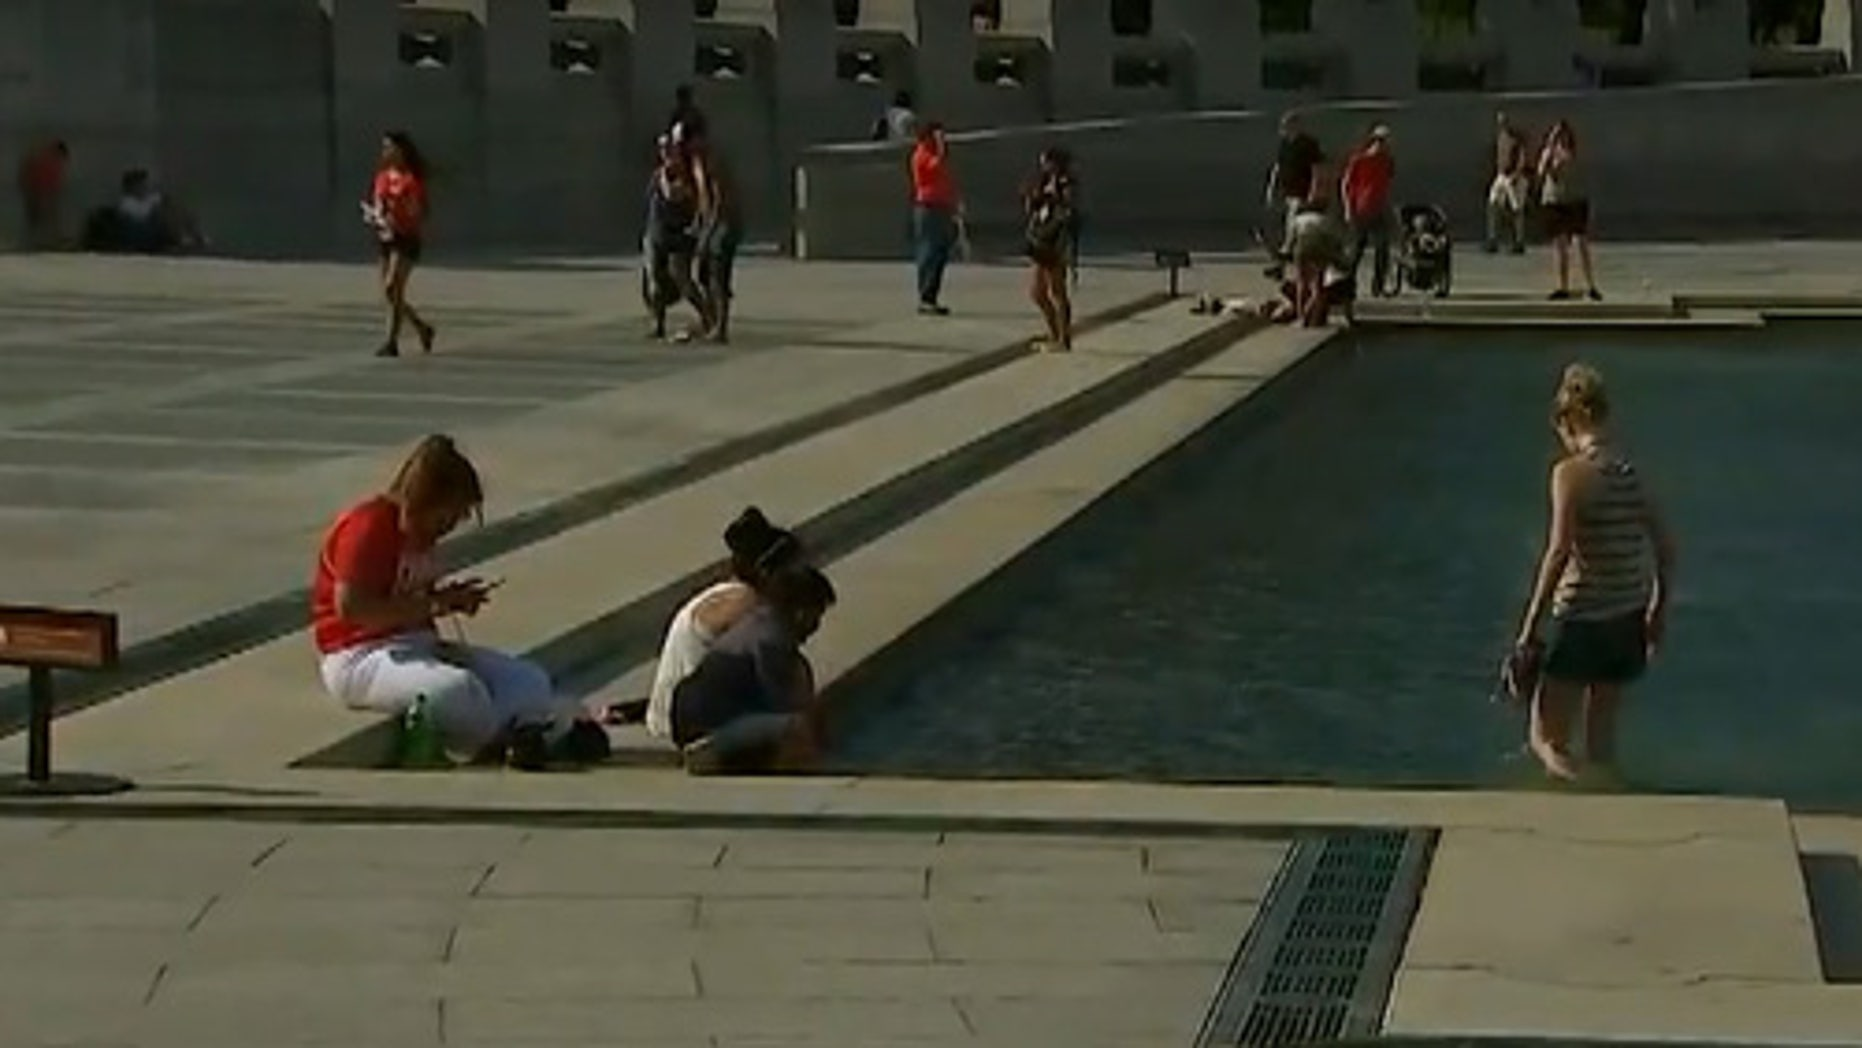 July 2016: Visitors to the National World War II Memorial, Washington, D.C. Fox 5 News